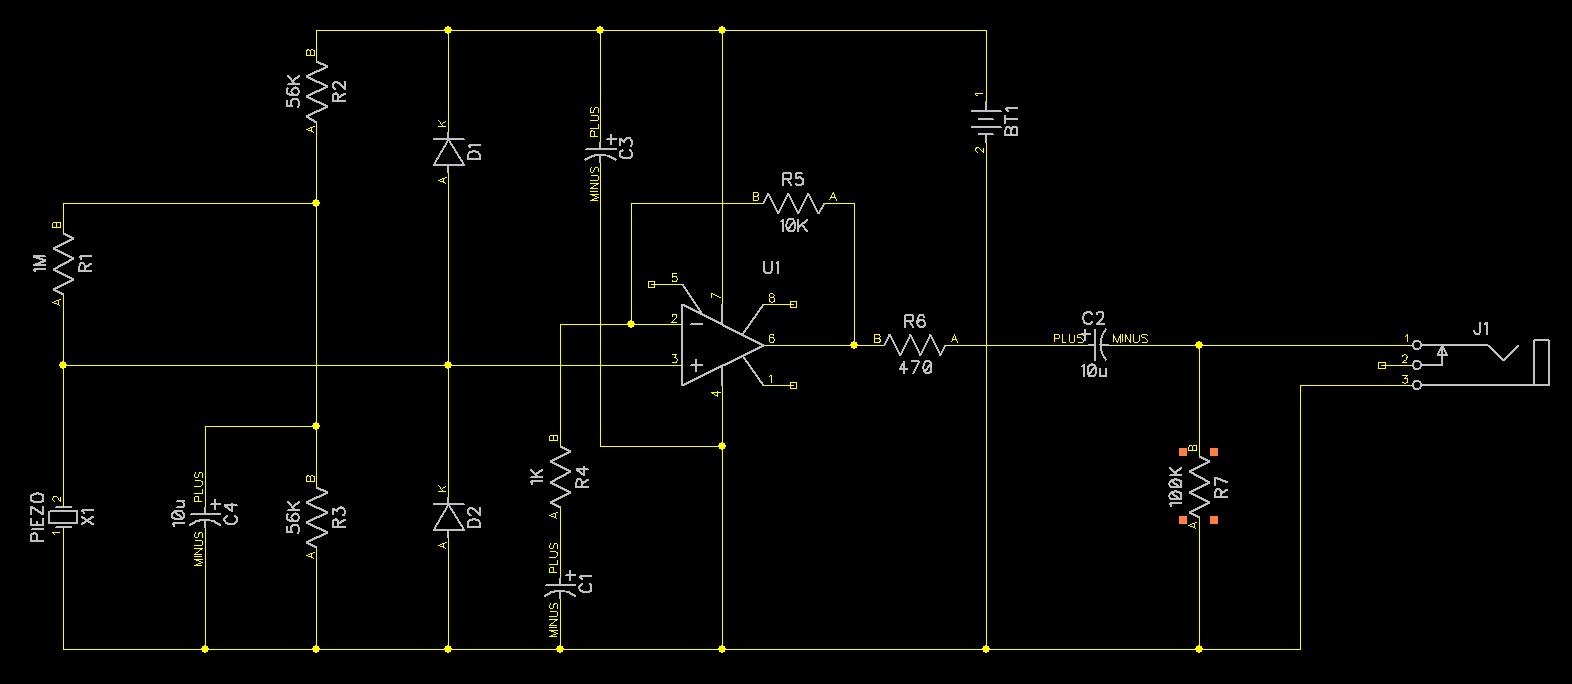 Aufgebaut Build Piezo Contact Mic Amplifierlow Noise Version With Low Audio Preamplifier Circuit Redrawn Schematic Made Diptrace